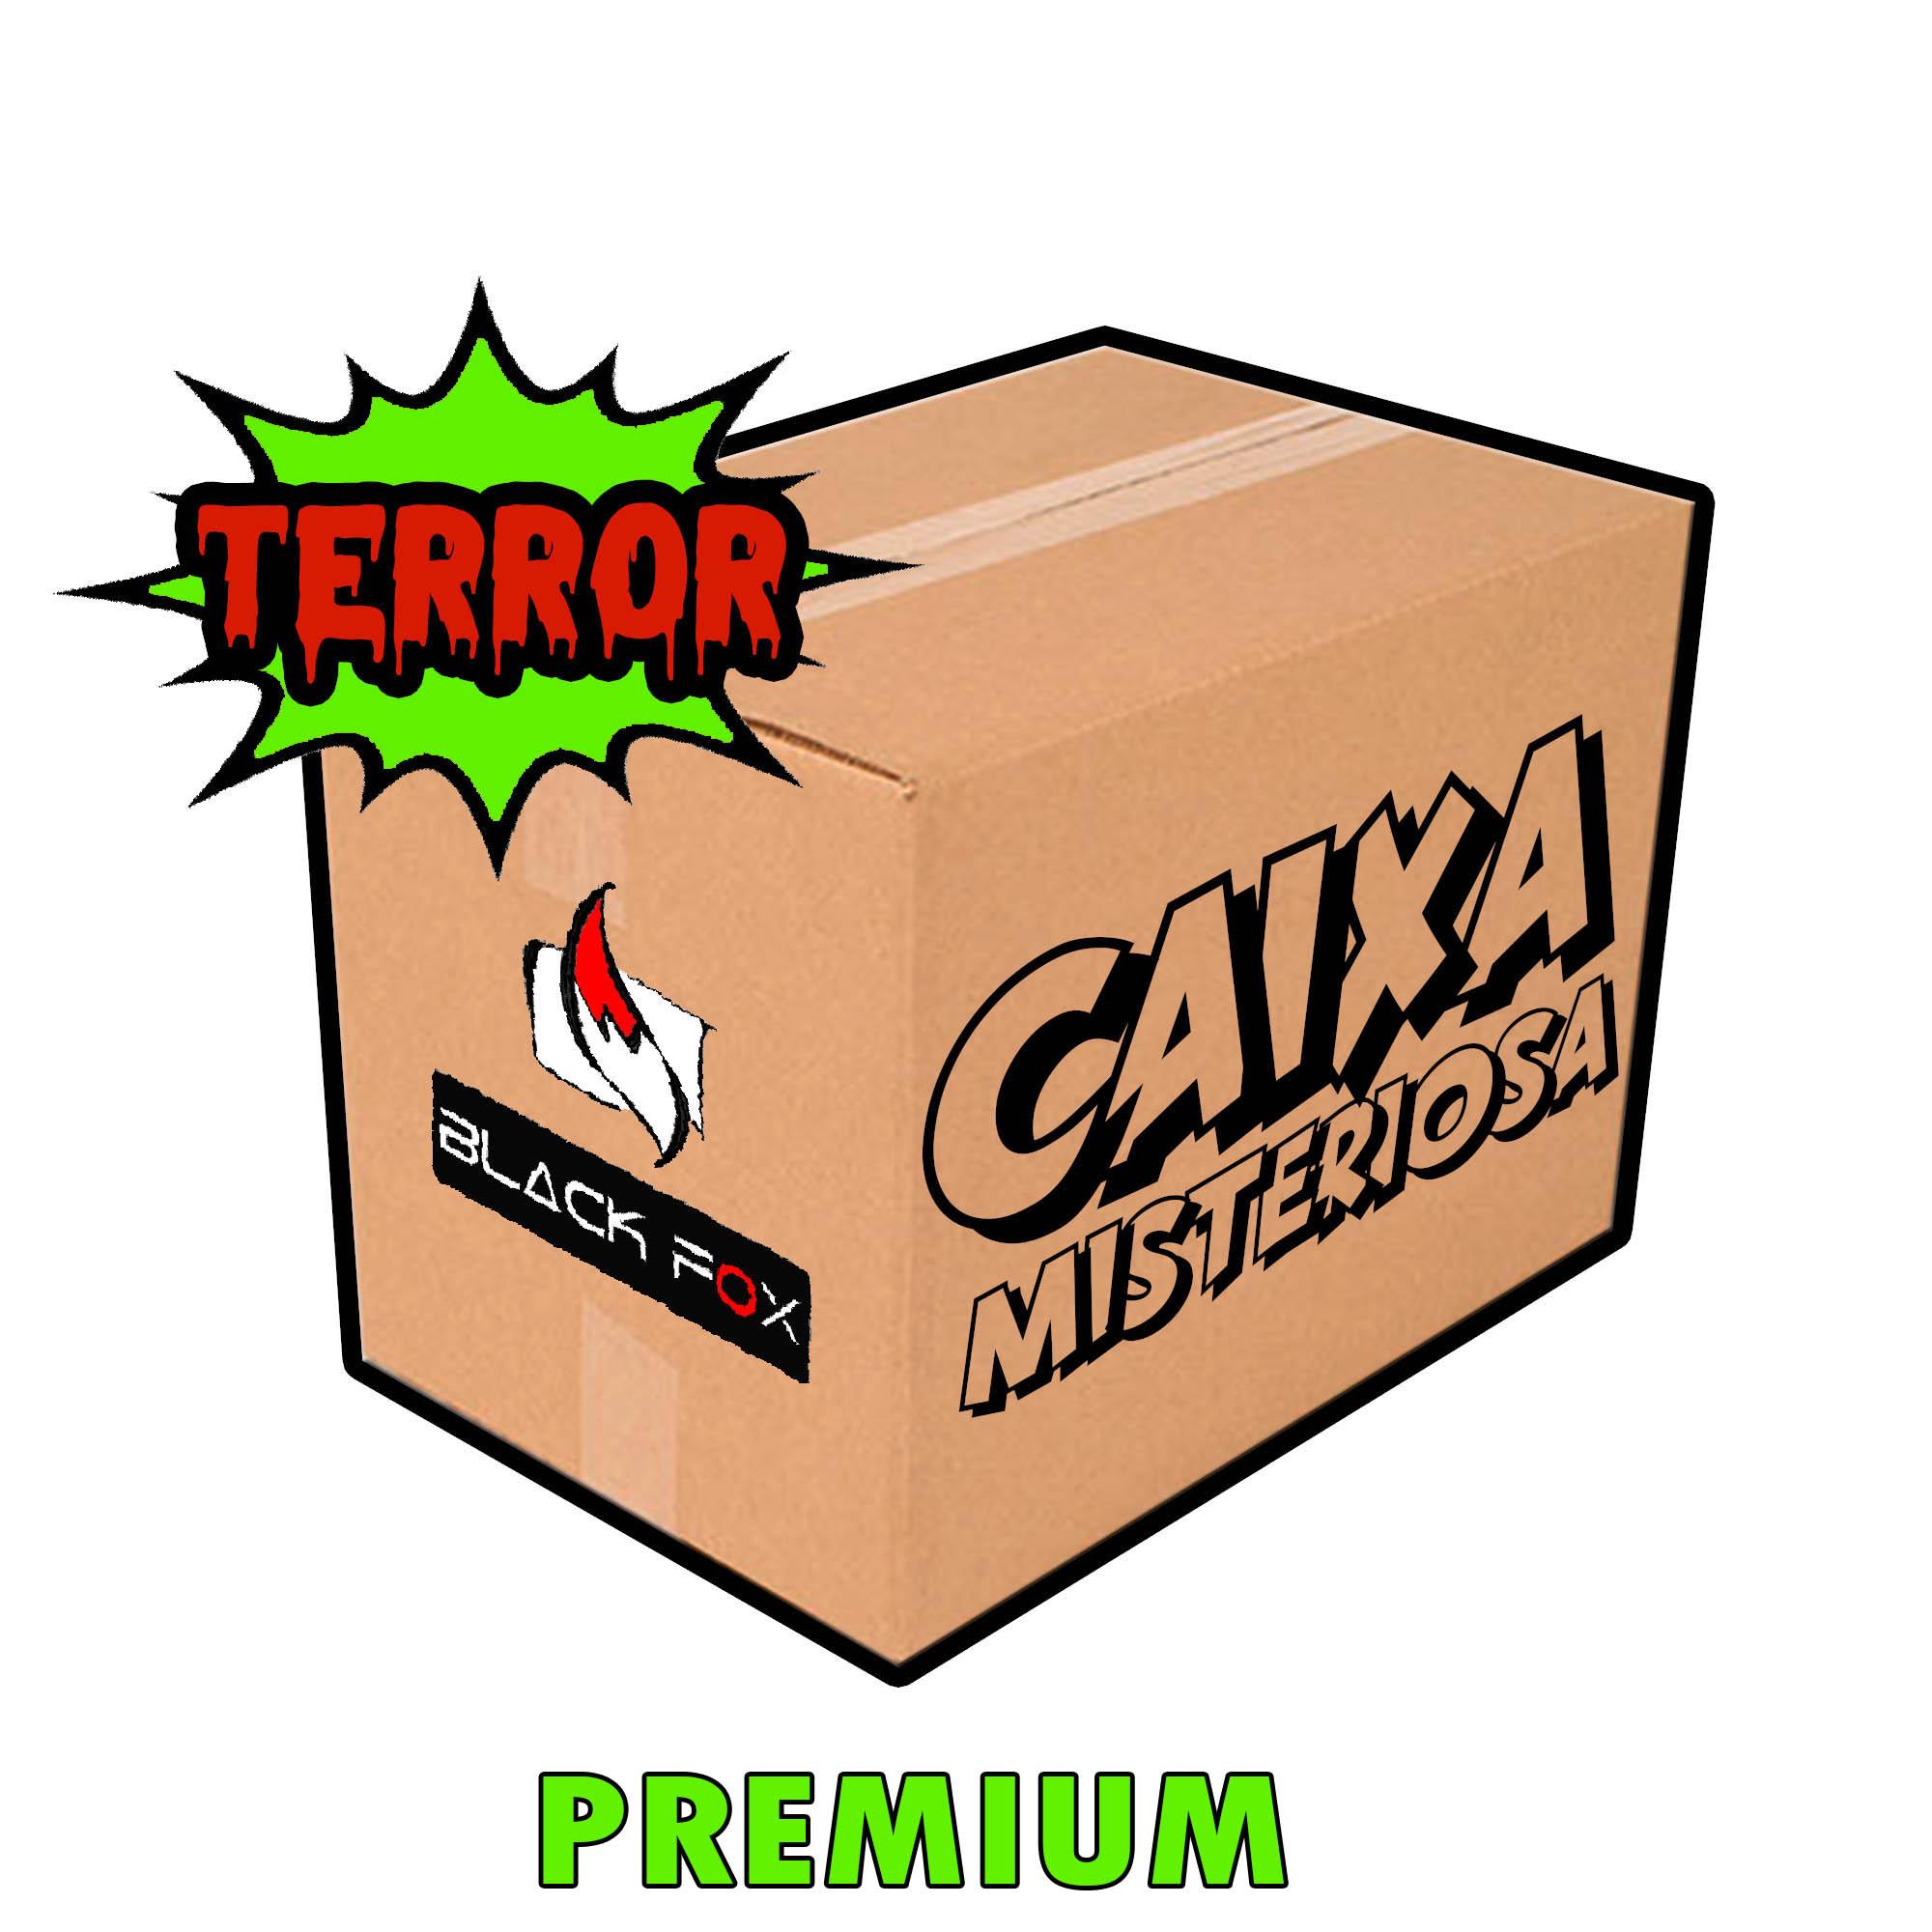 CAIXA MISTERIOSA MYSTERY BOX SURPRESA TERROR PREMIUM